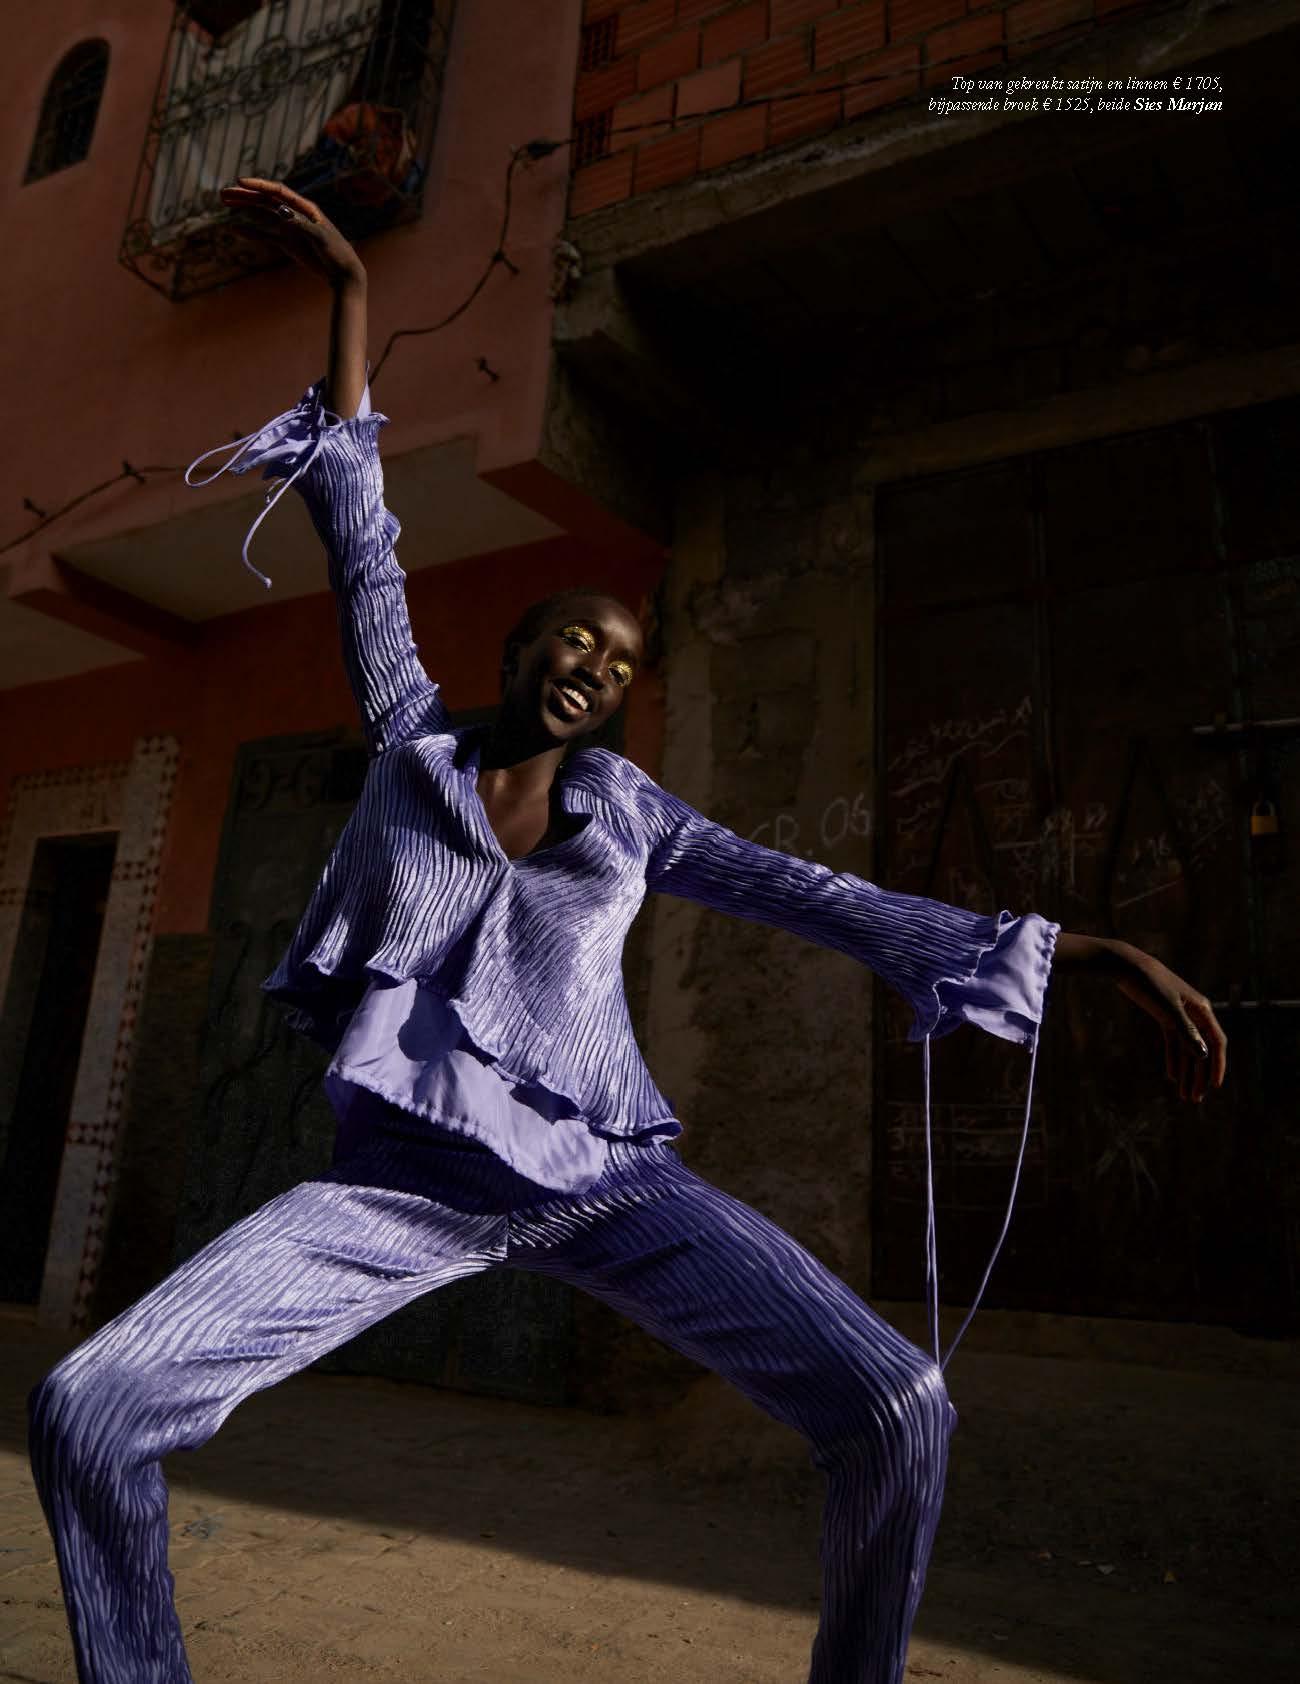 Niko Riam by Carlijn Jacobs for Vogue Netherlands (7).jpg